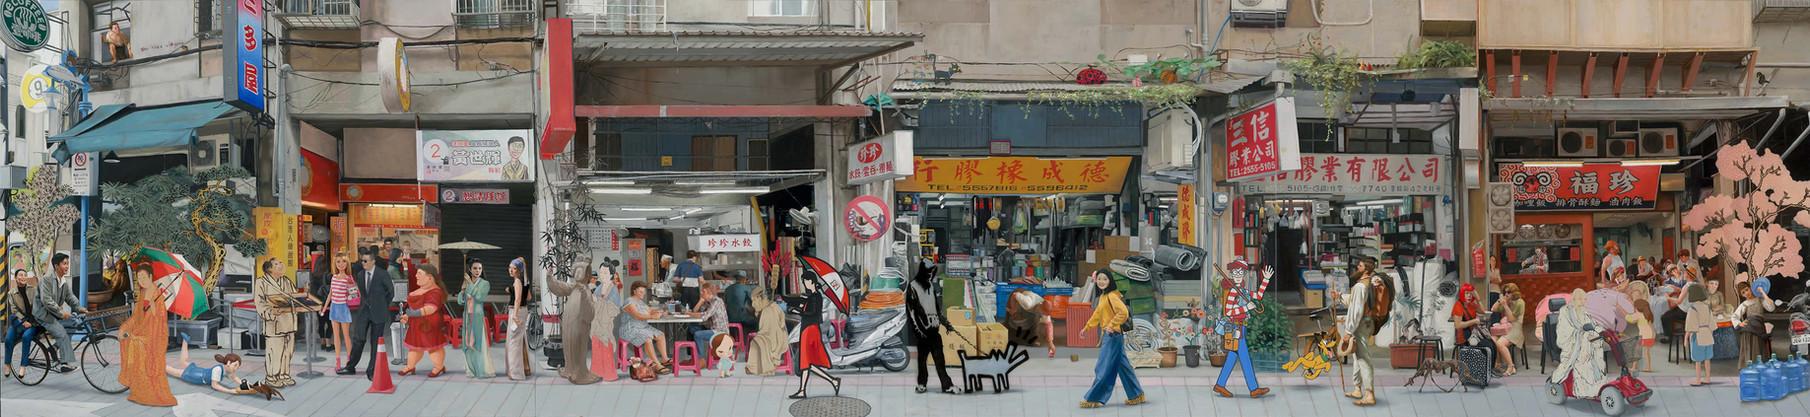 Kwon Neung Artistic Street (2), 2019 Oil on canvas 90 x 390 cm